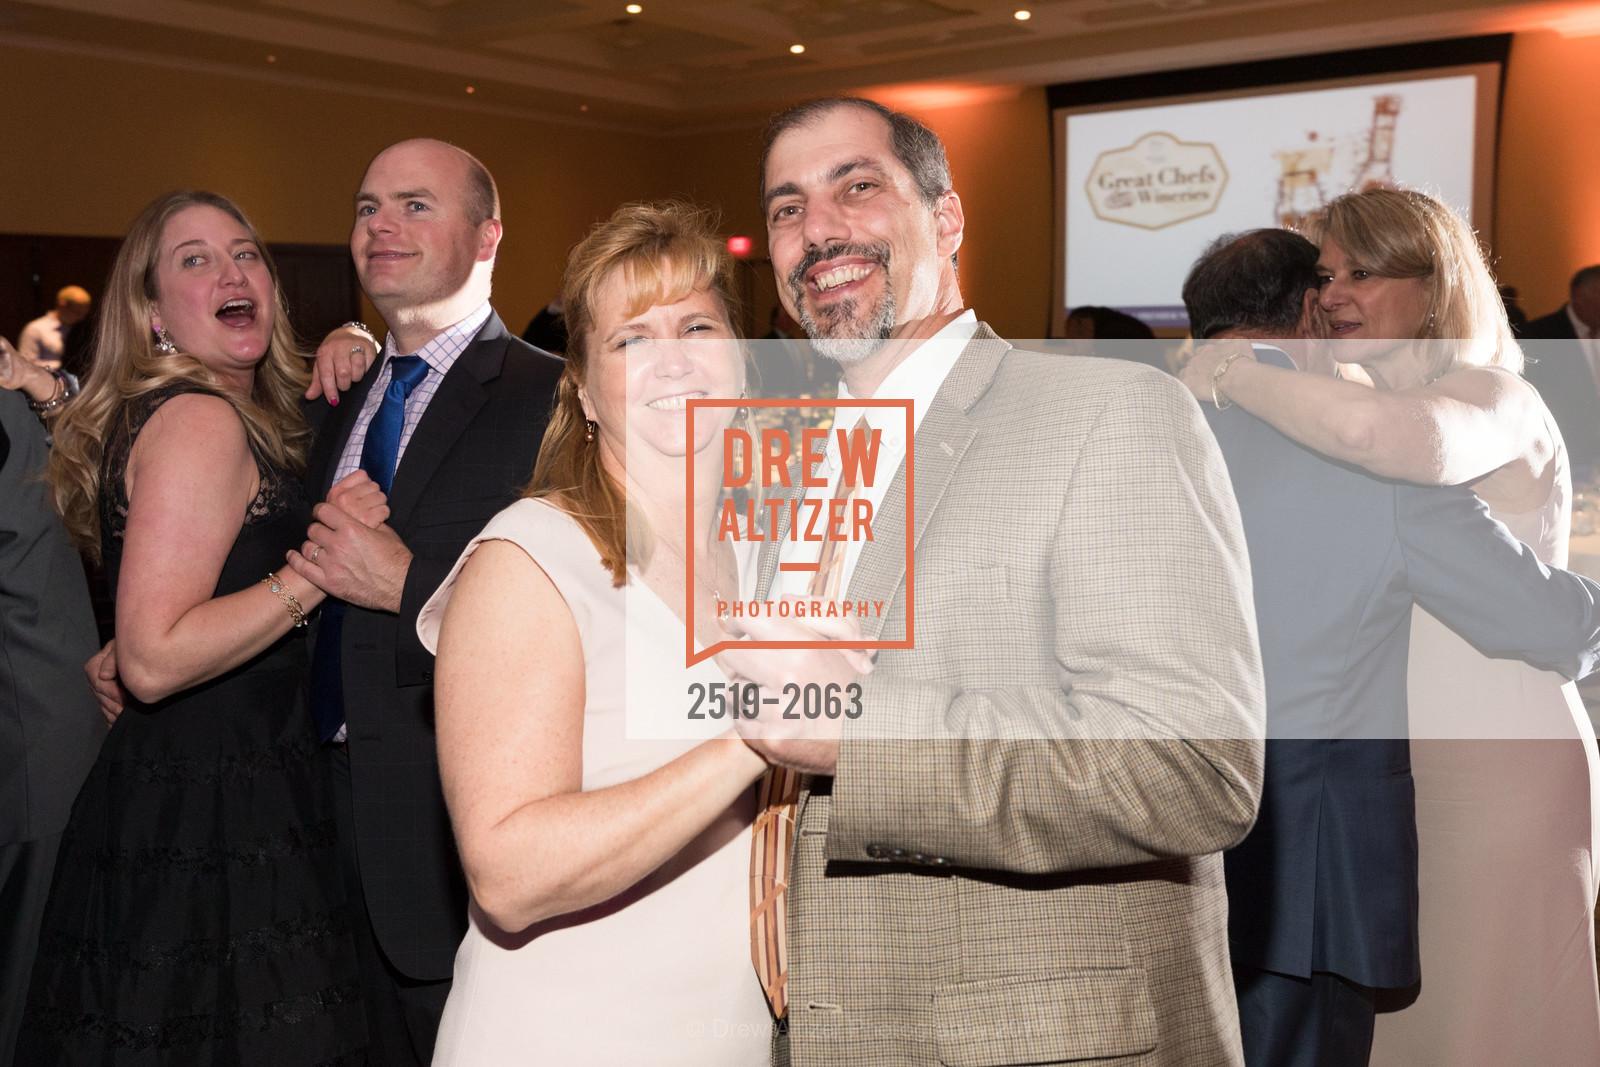 Cheryl Zammataro, Fred Zammataro, Great Chefs and Wineries, Peacock Gap, April 22nd, 2017